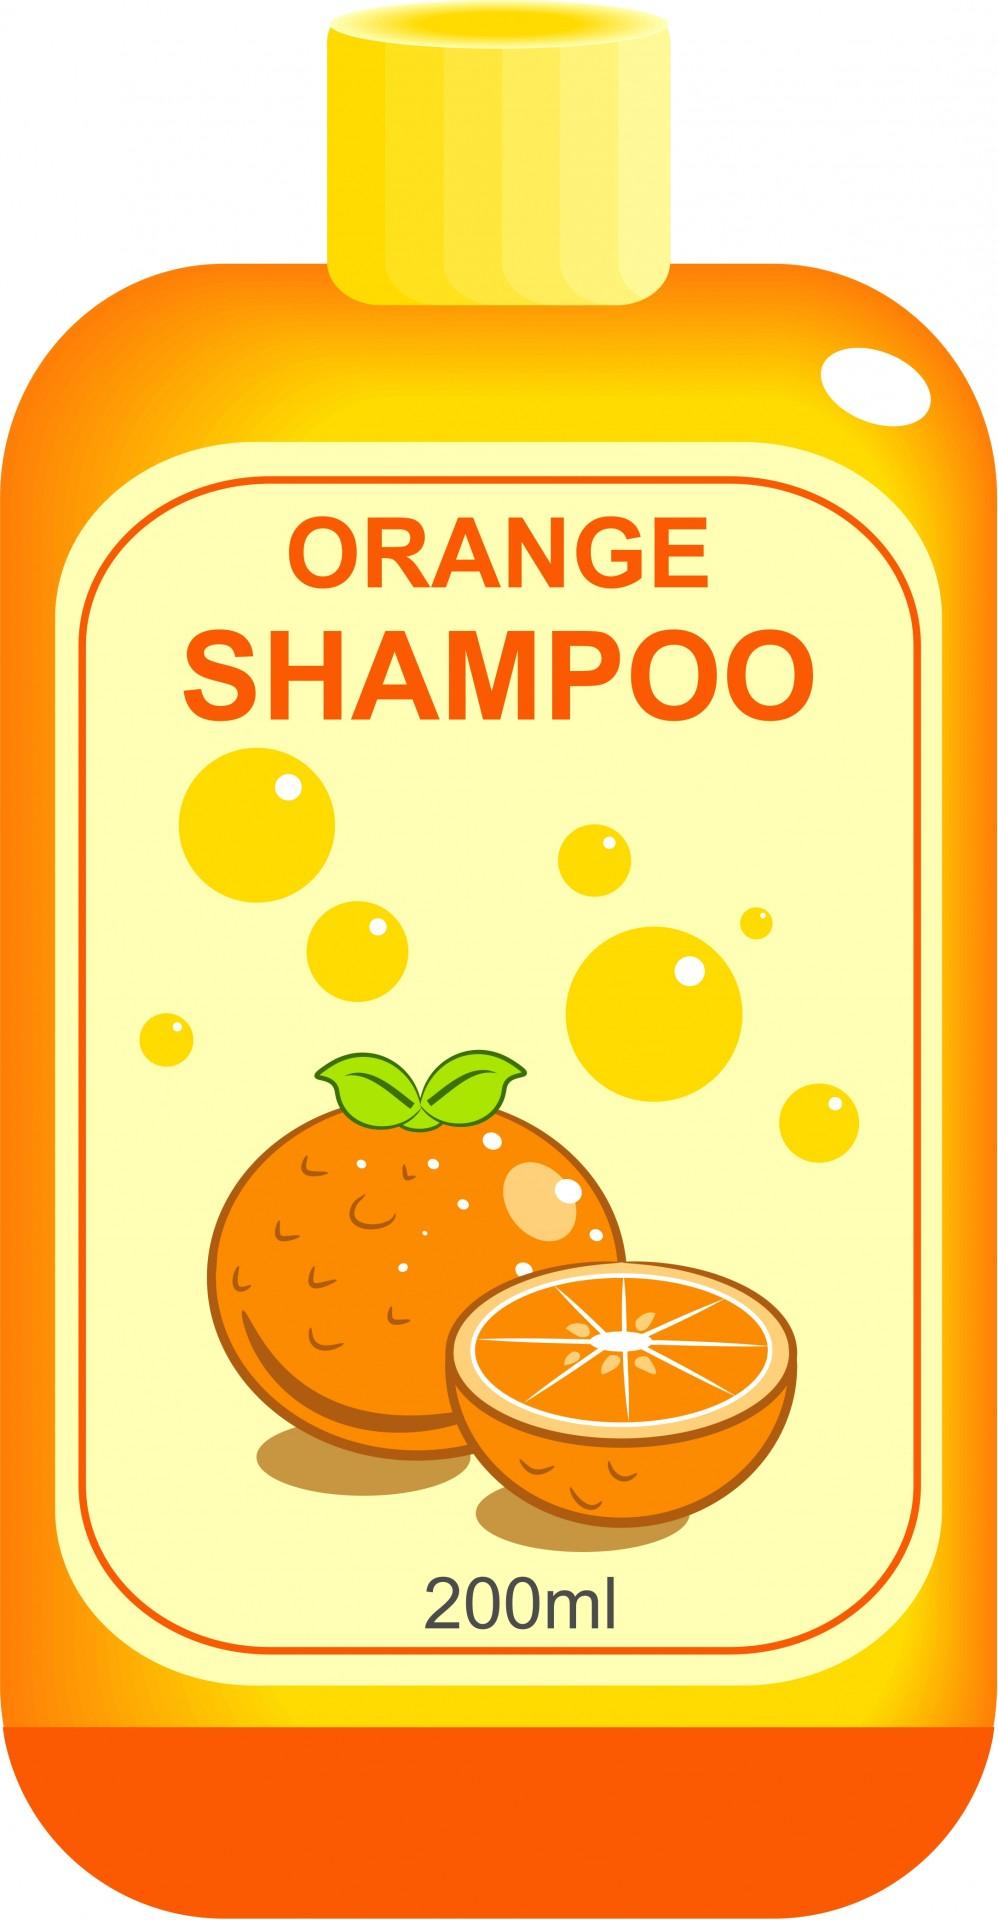 Free Shampoo Cliparts Download Free Clip Art Free Clip